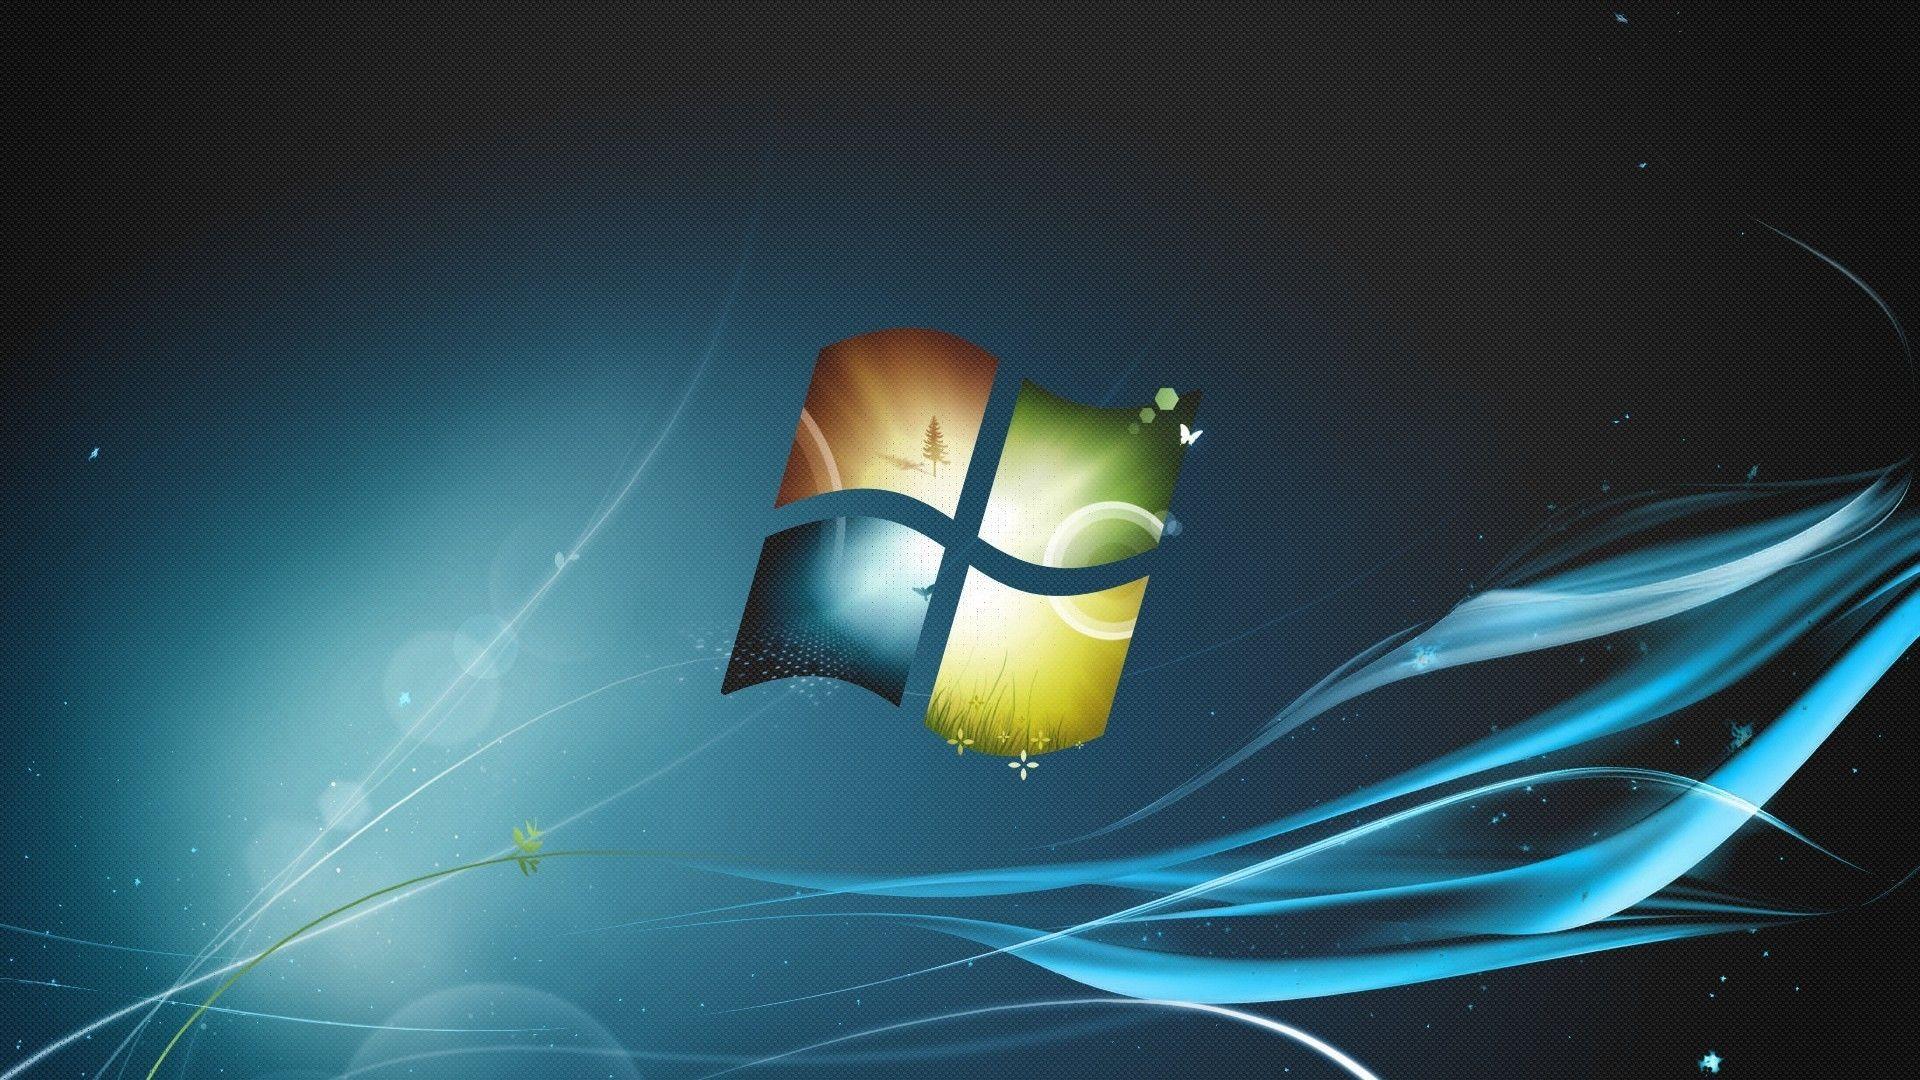 Logo Microsoft Windows Windows 7 Wallpaper Windows Wallpaper Lenovo Wallpapers Windows Desktop Wallpaper